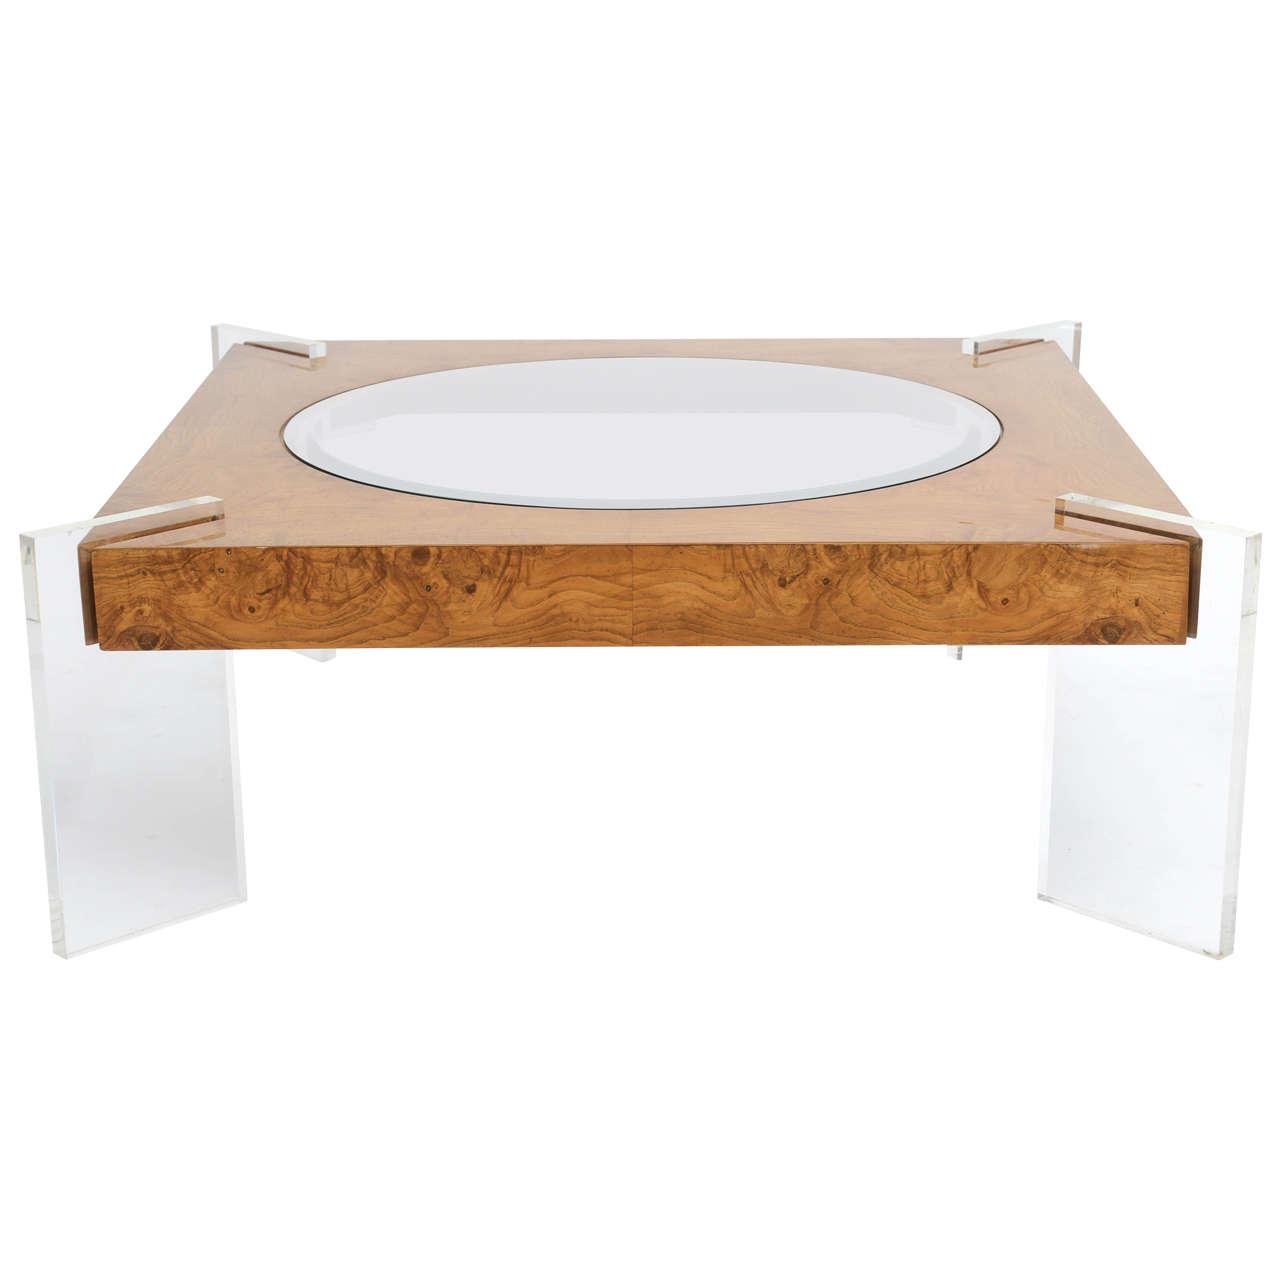 Burl Walnut, Lucite and Glass Low Table, Vladimir Kagan